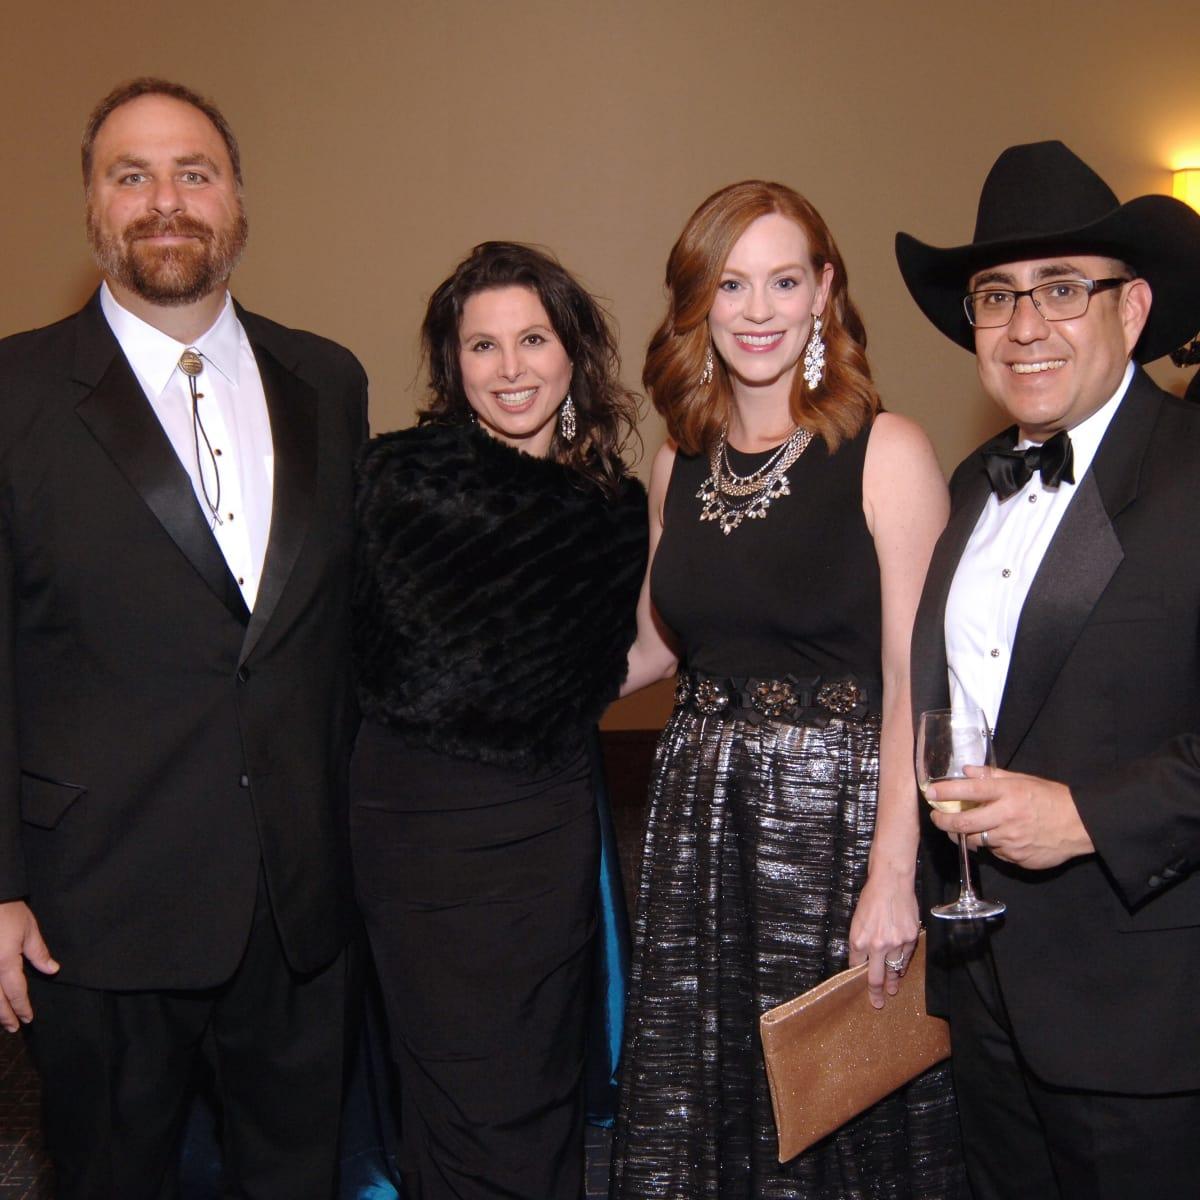 UH Law gala, April 2016, Judge Mike Engelhart, Eva Engelhart, Andria Rondon, Judge Reece Rondon